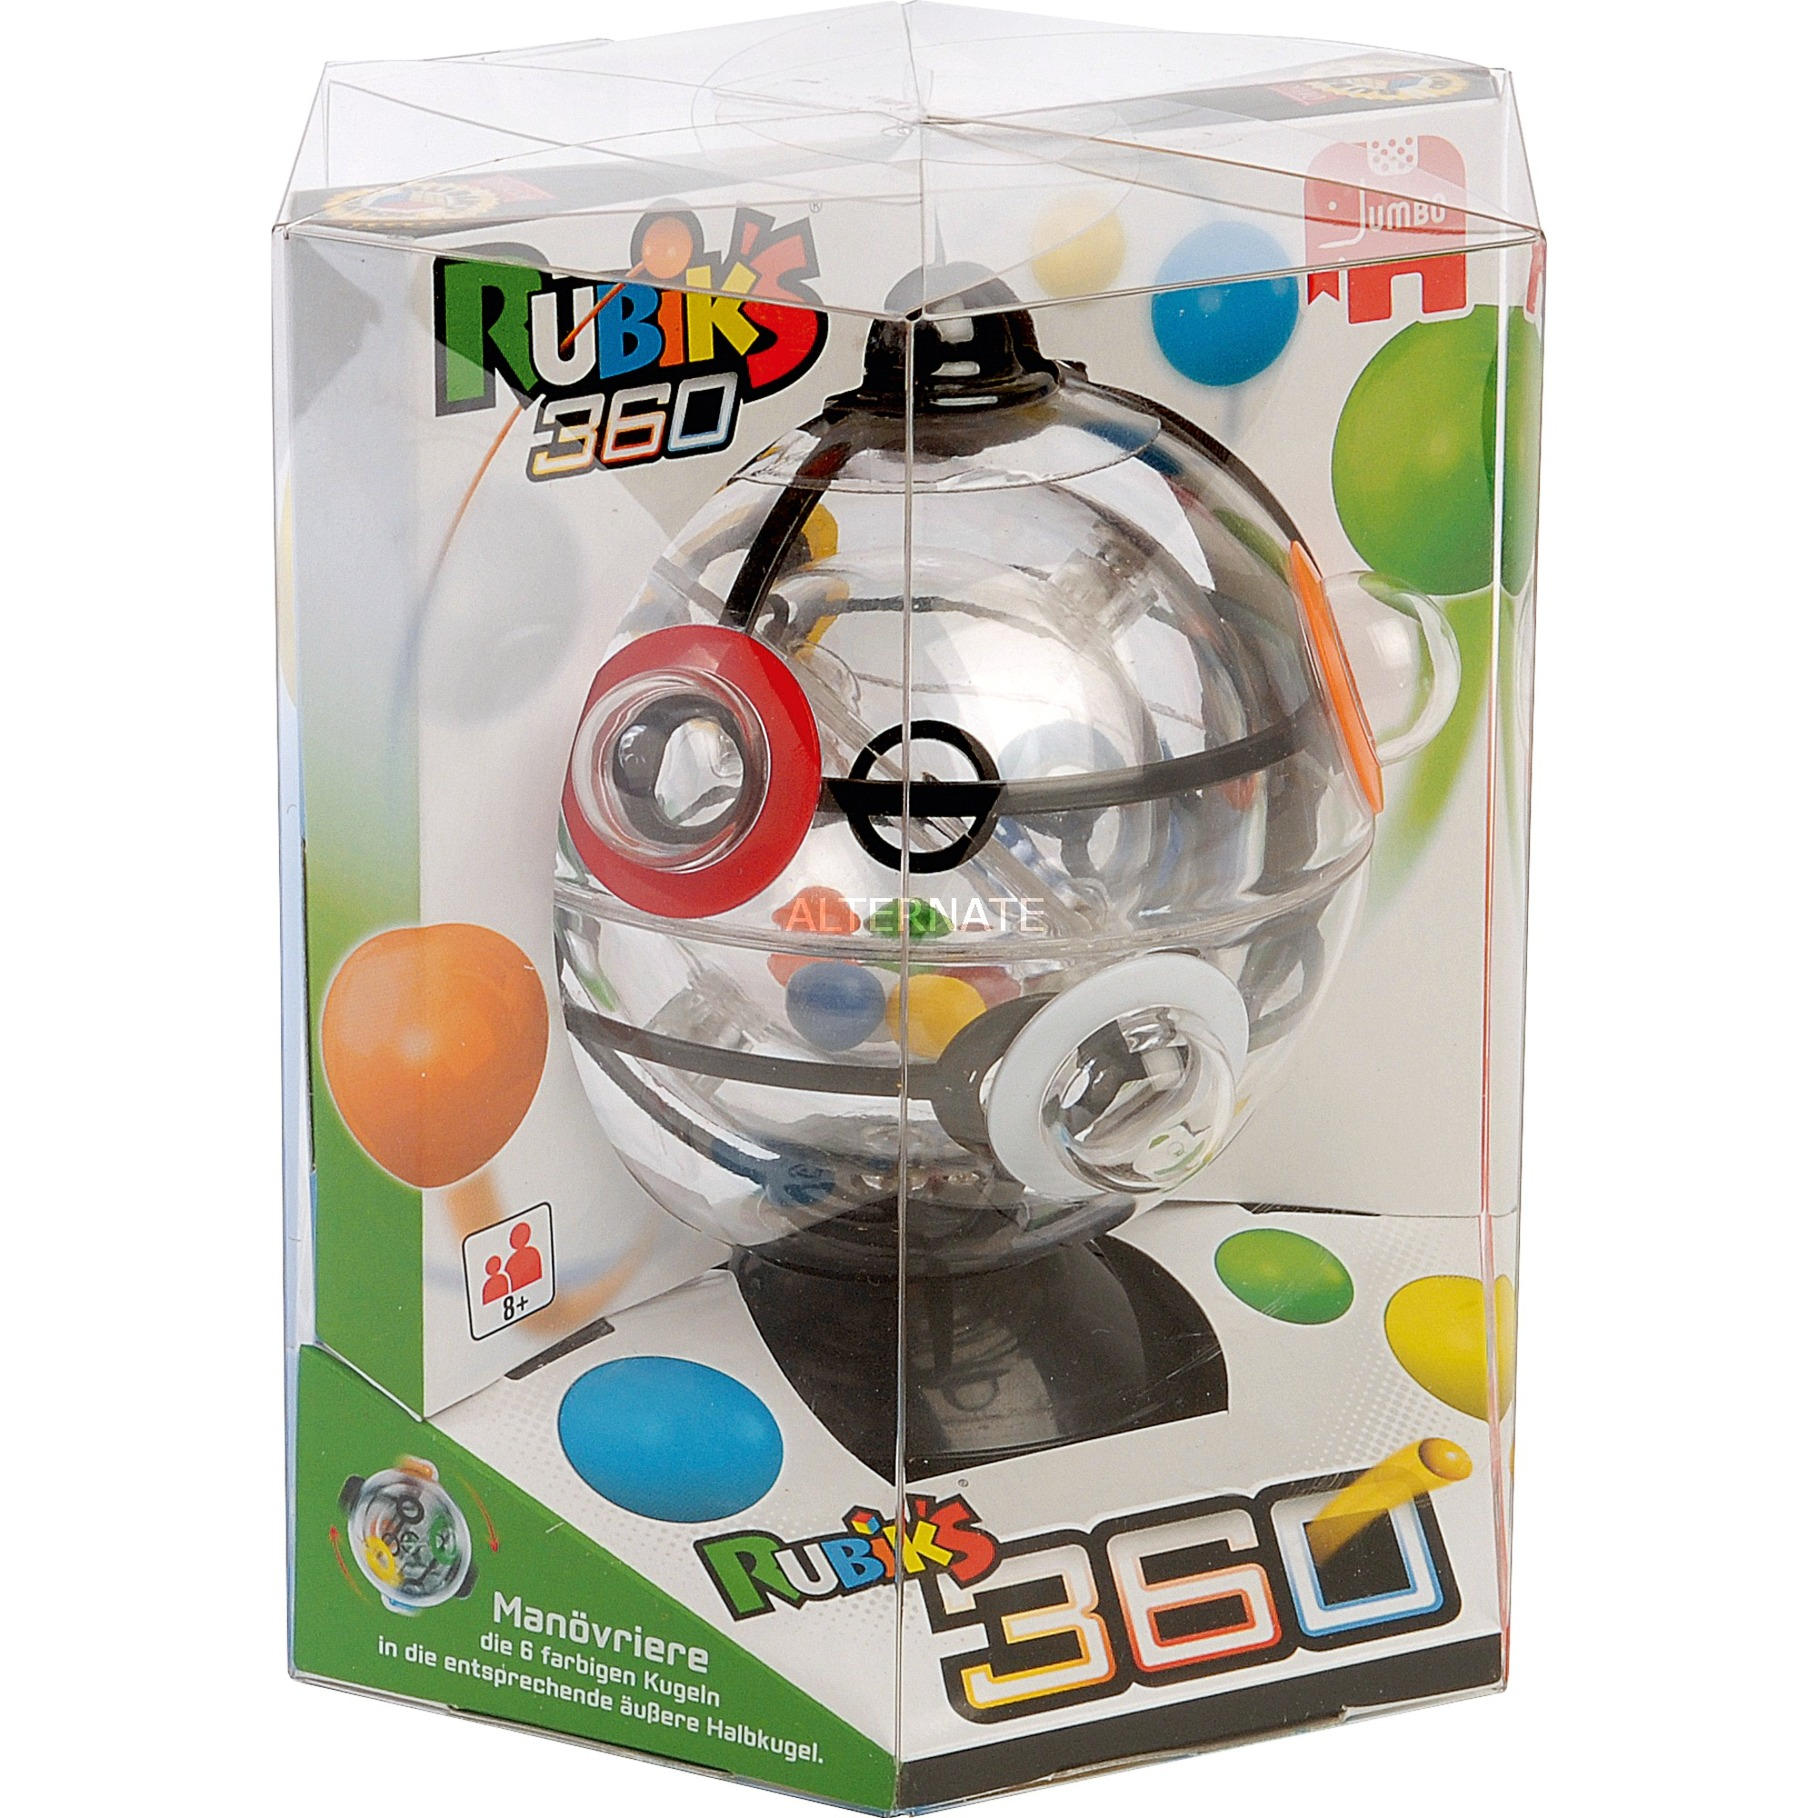 Rubik's 360, Jeu d'adresse